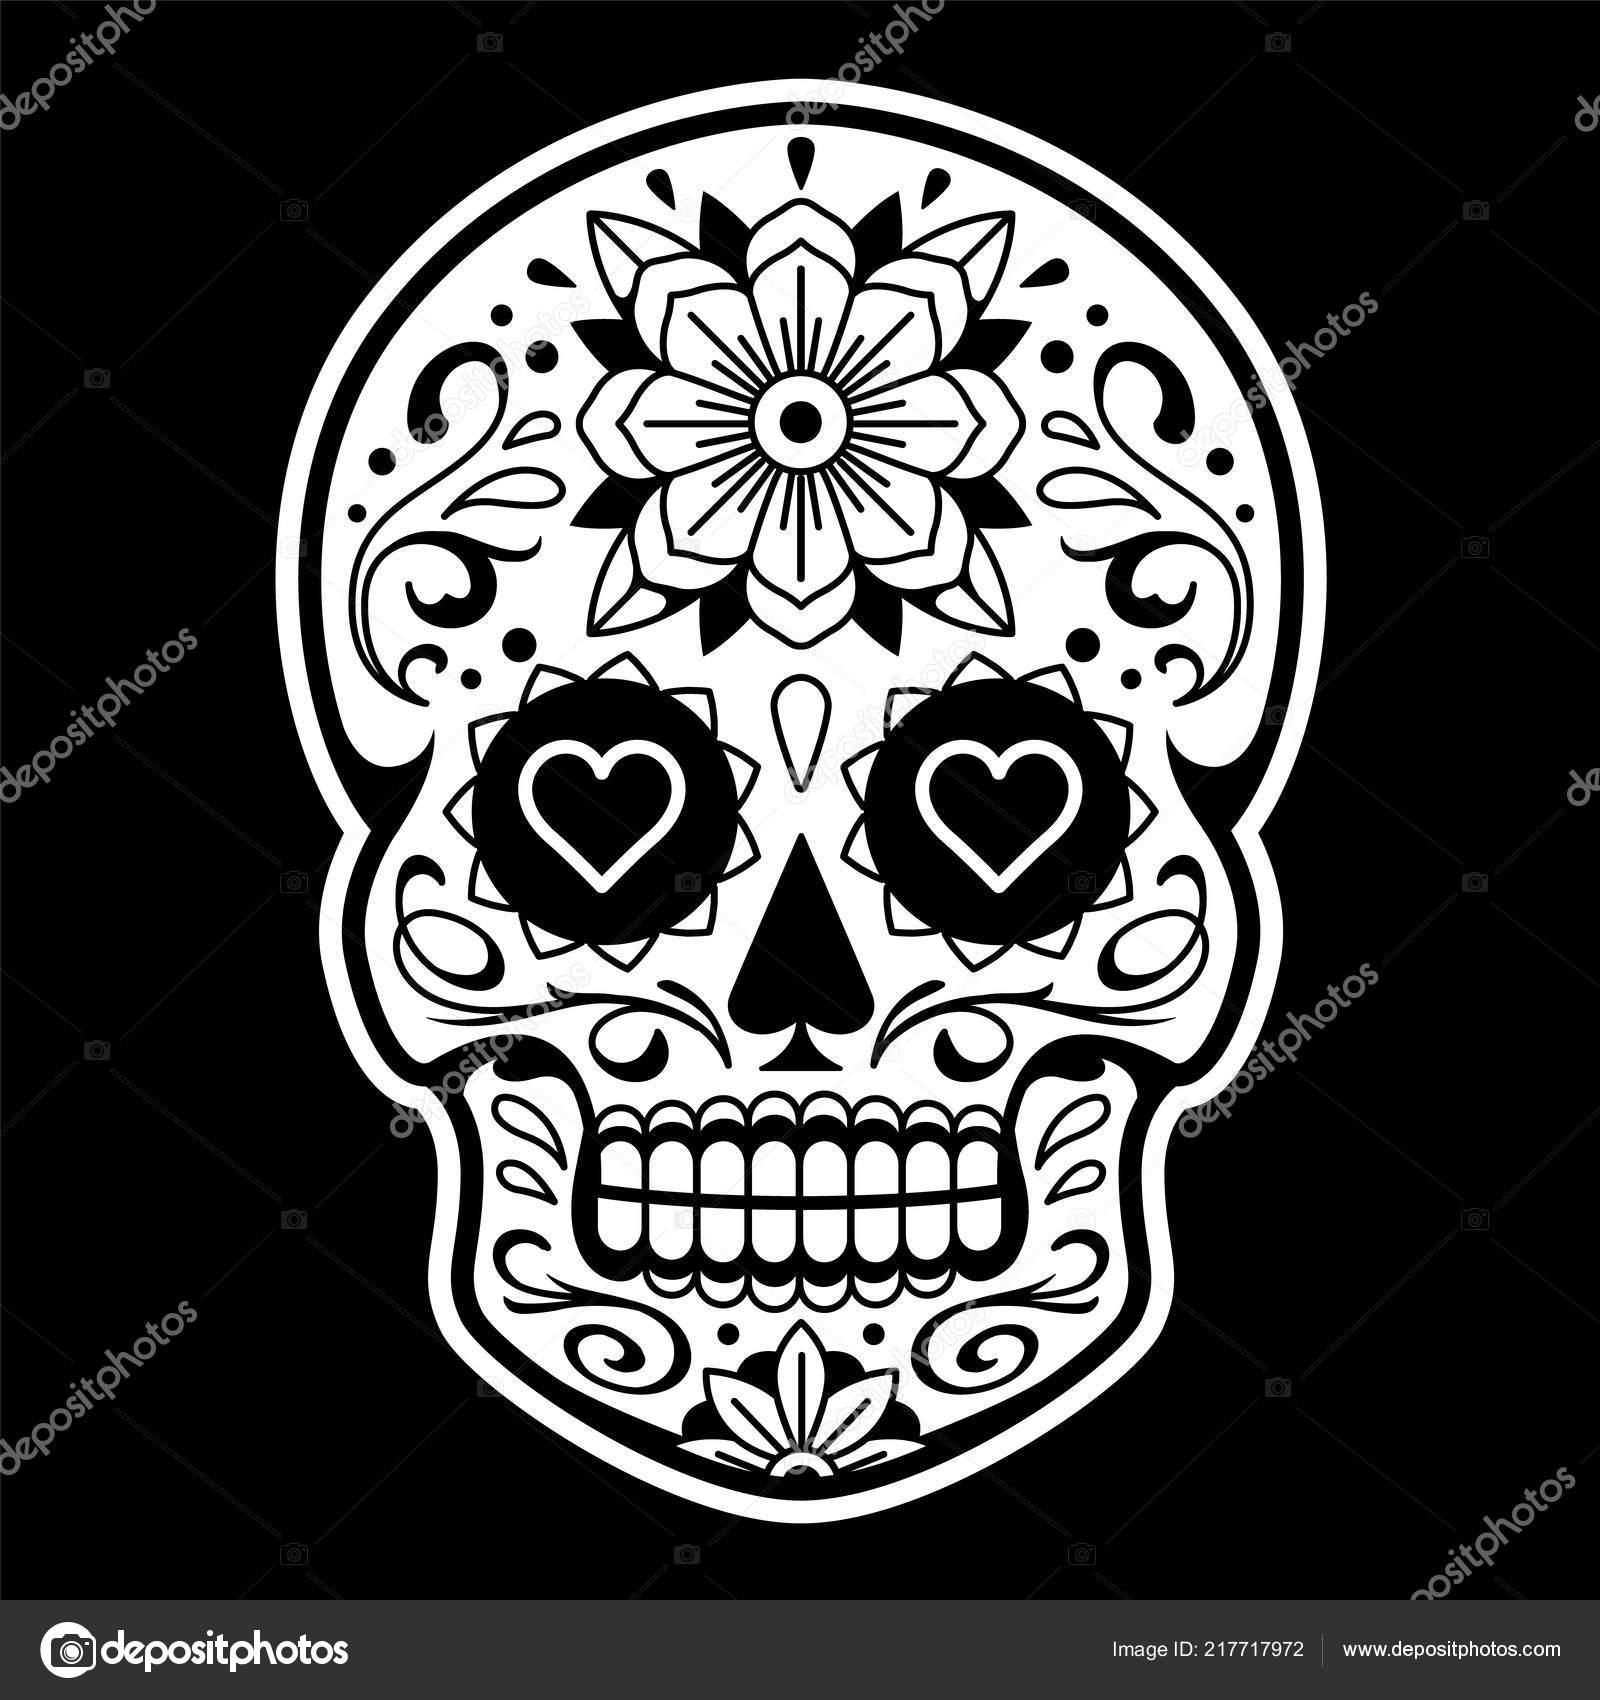 Vector Crâne Mexicain Avec Des Motifs Crâne Old School Tattoo